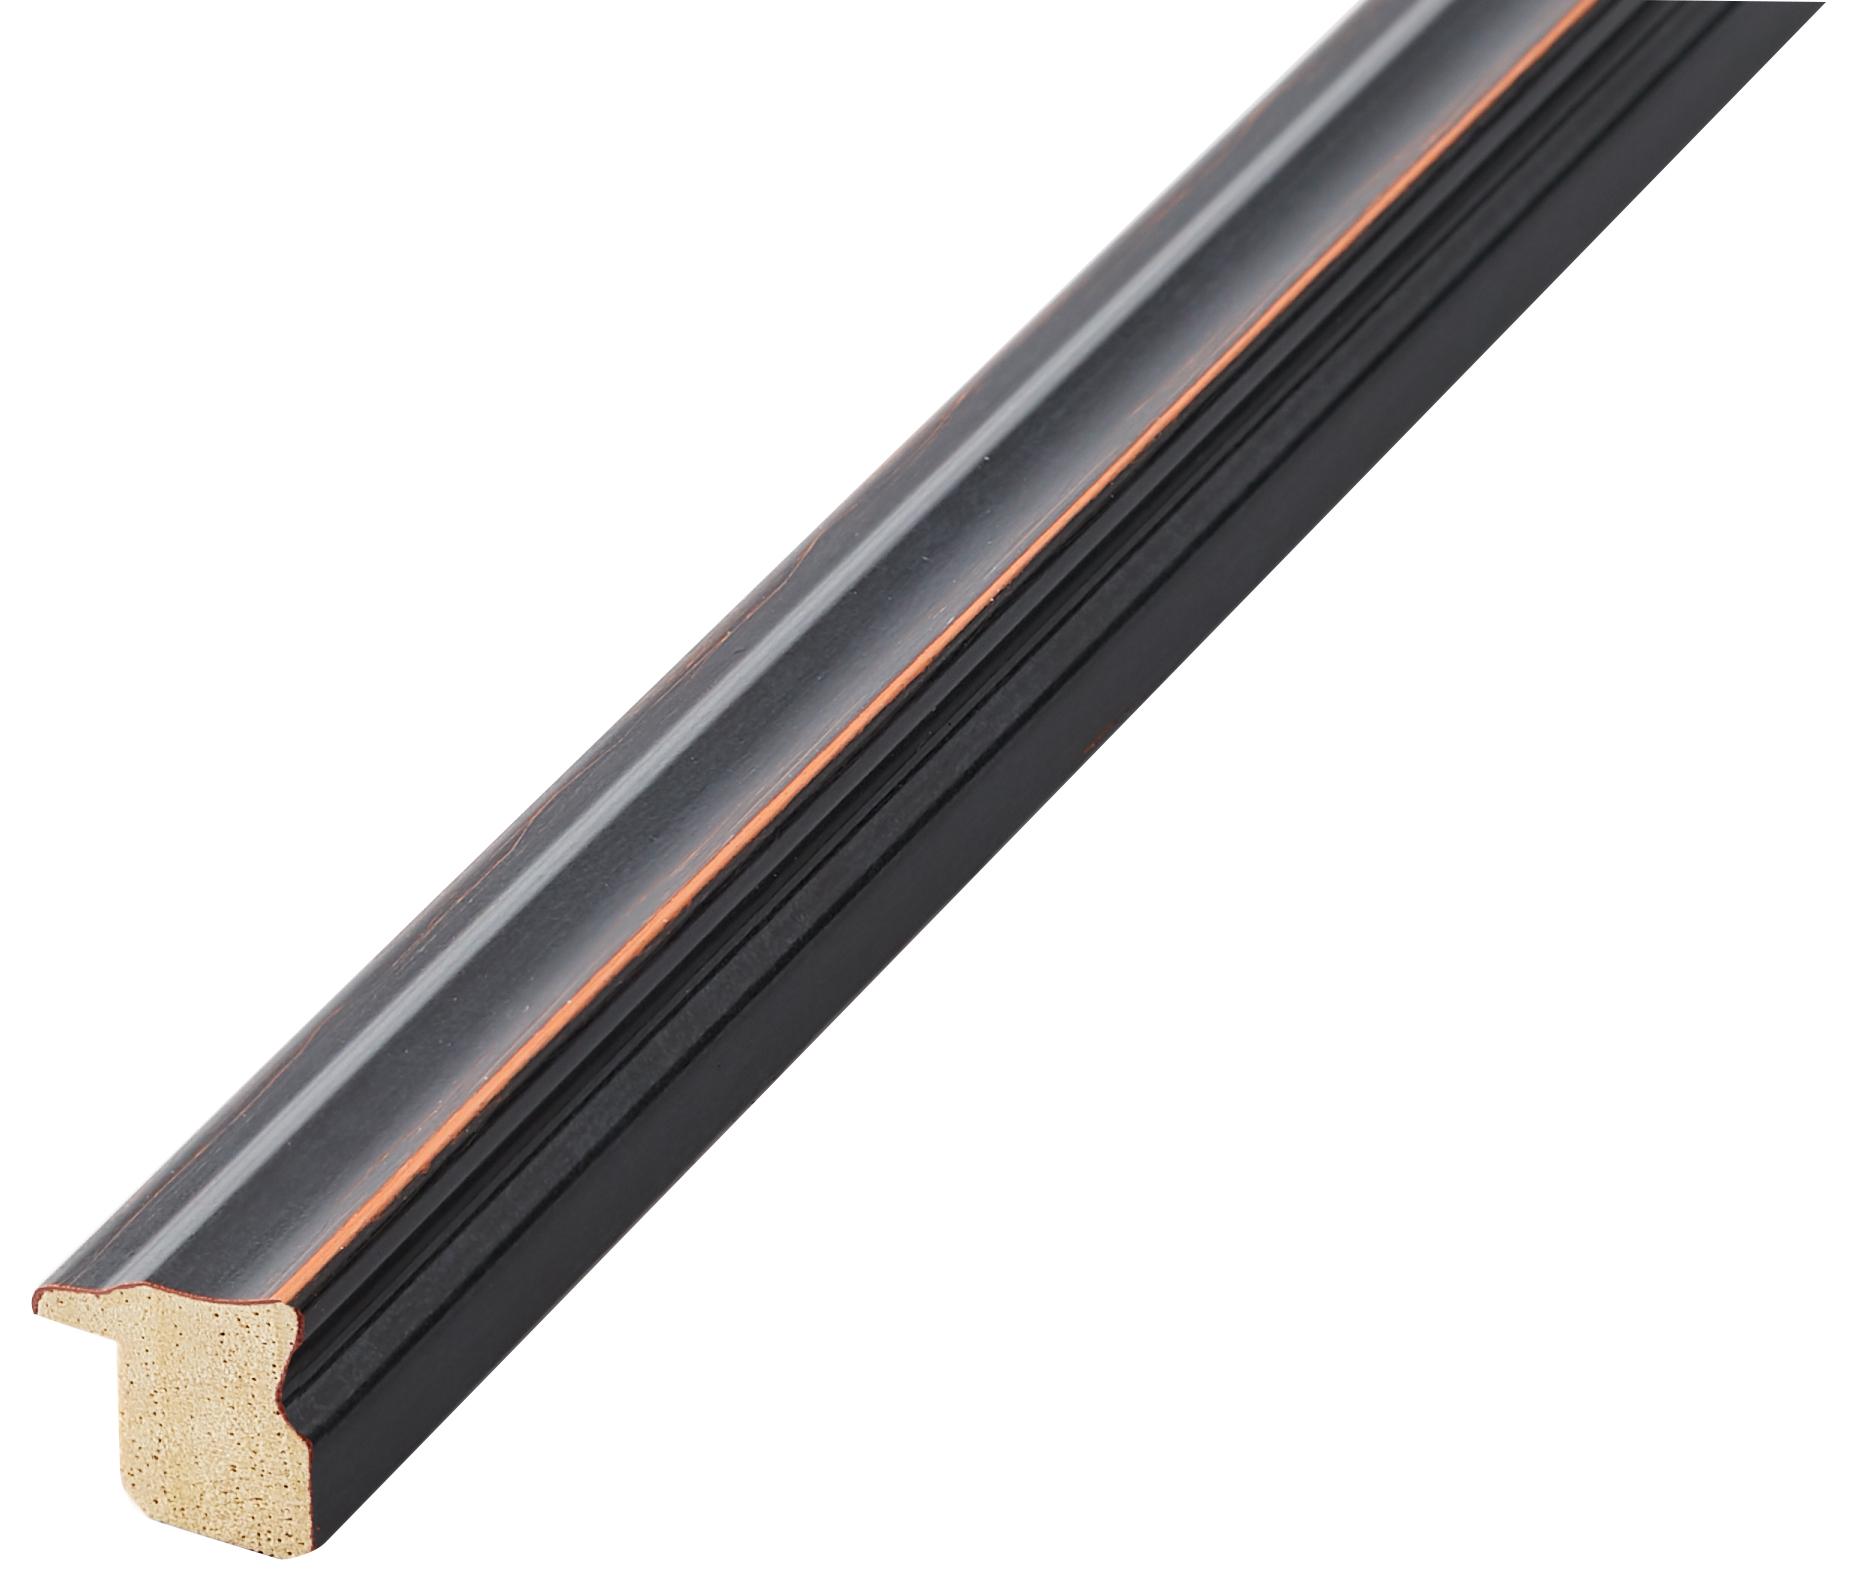 Moulding finger-joint pine Width 16mm Height 16, Black